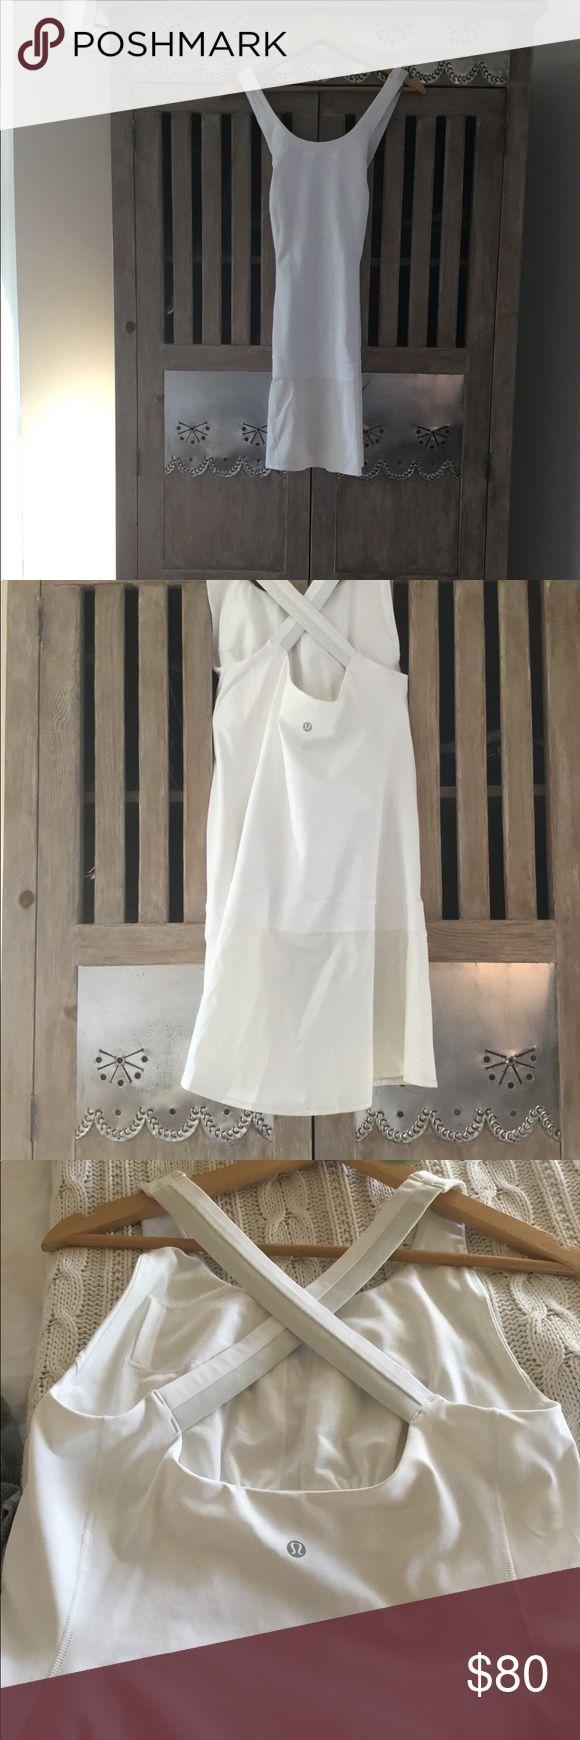 White Lululemon Dress! Never worn! Unique white lulu dress! Built in chest support lululemon athletica Dresses